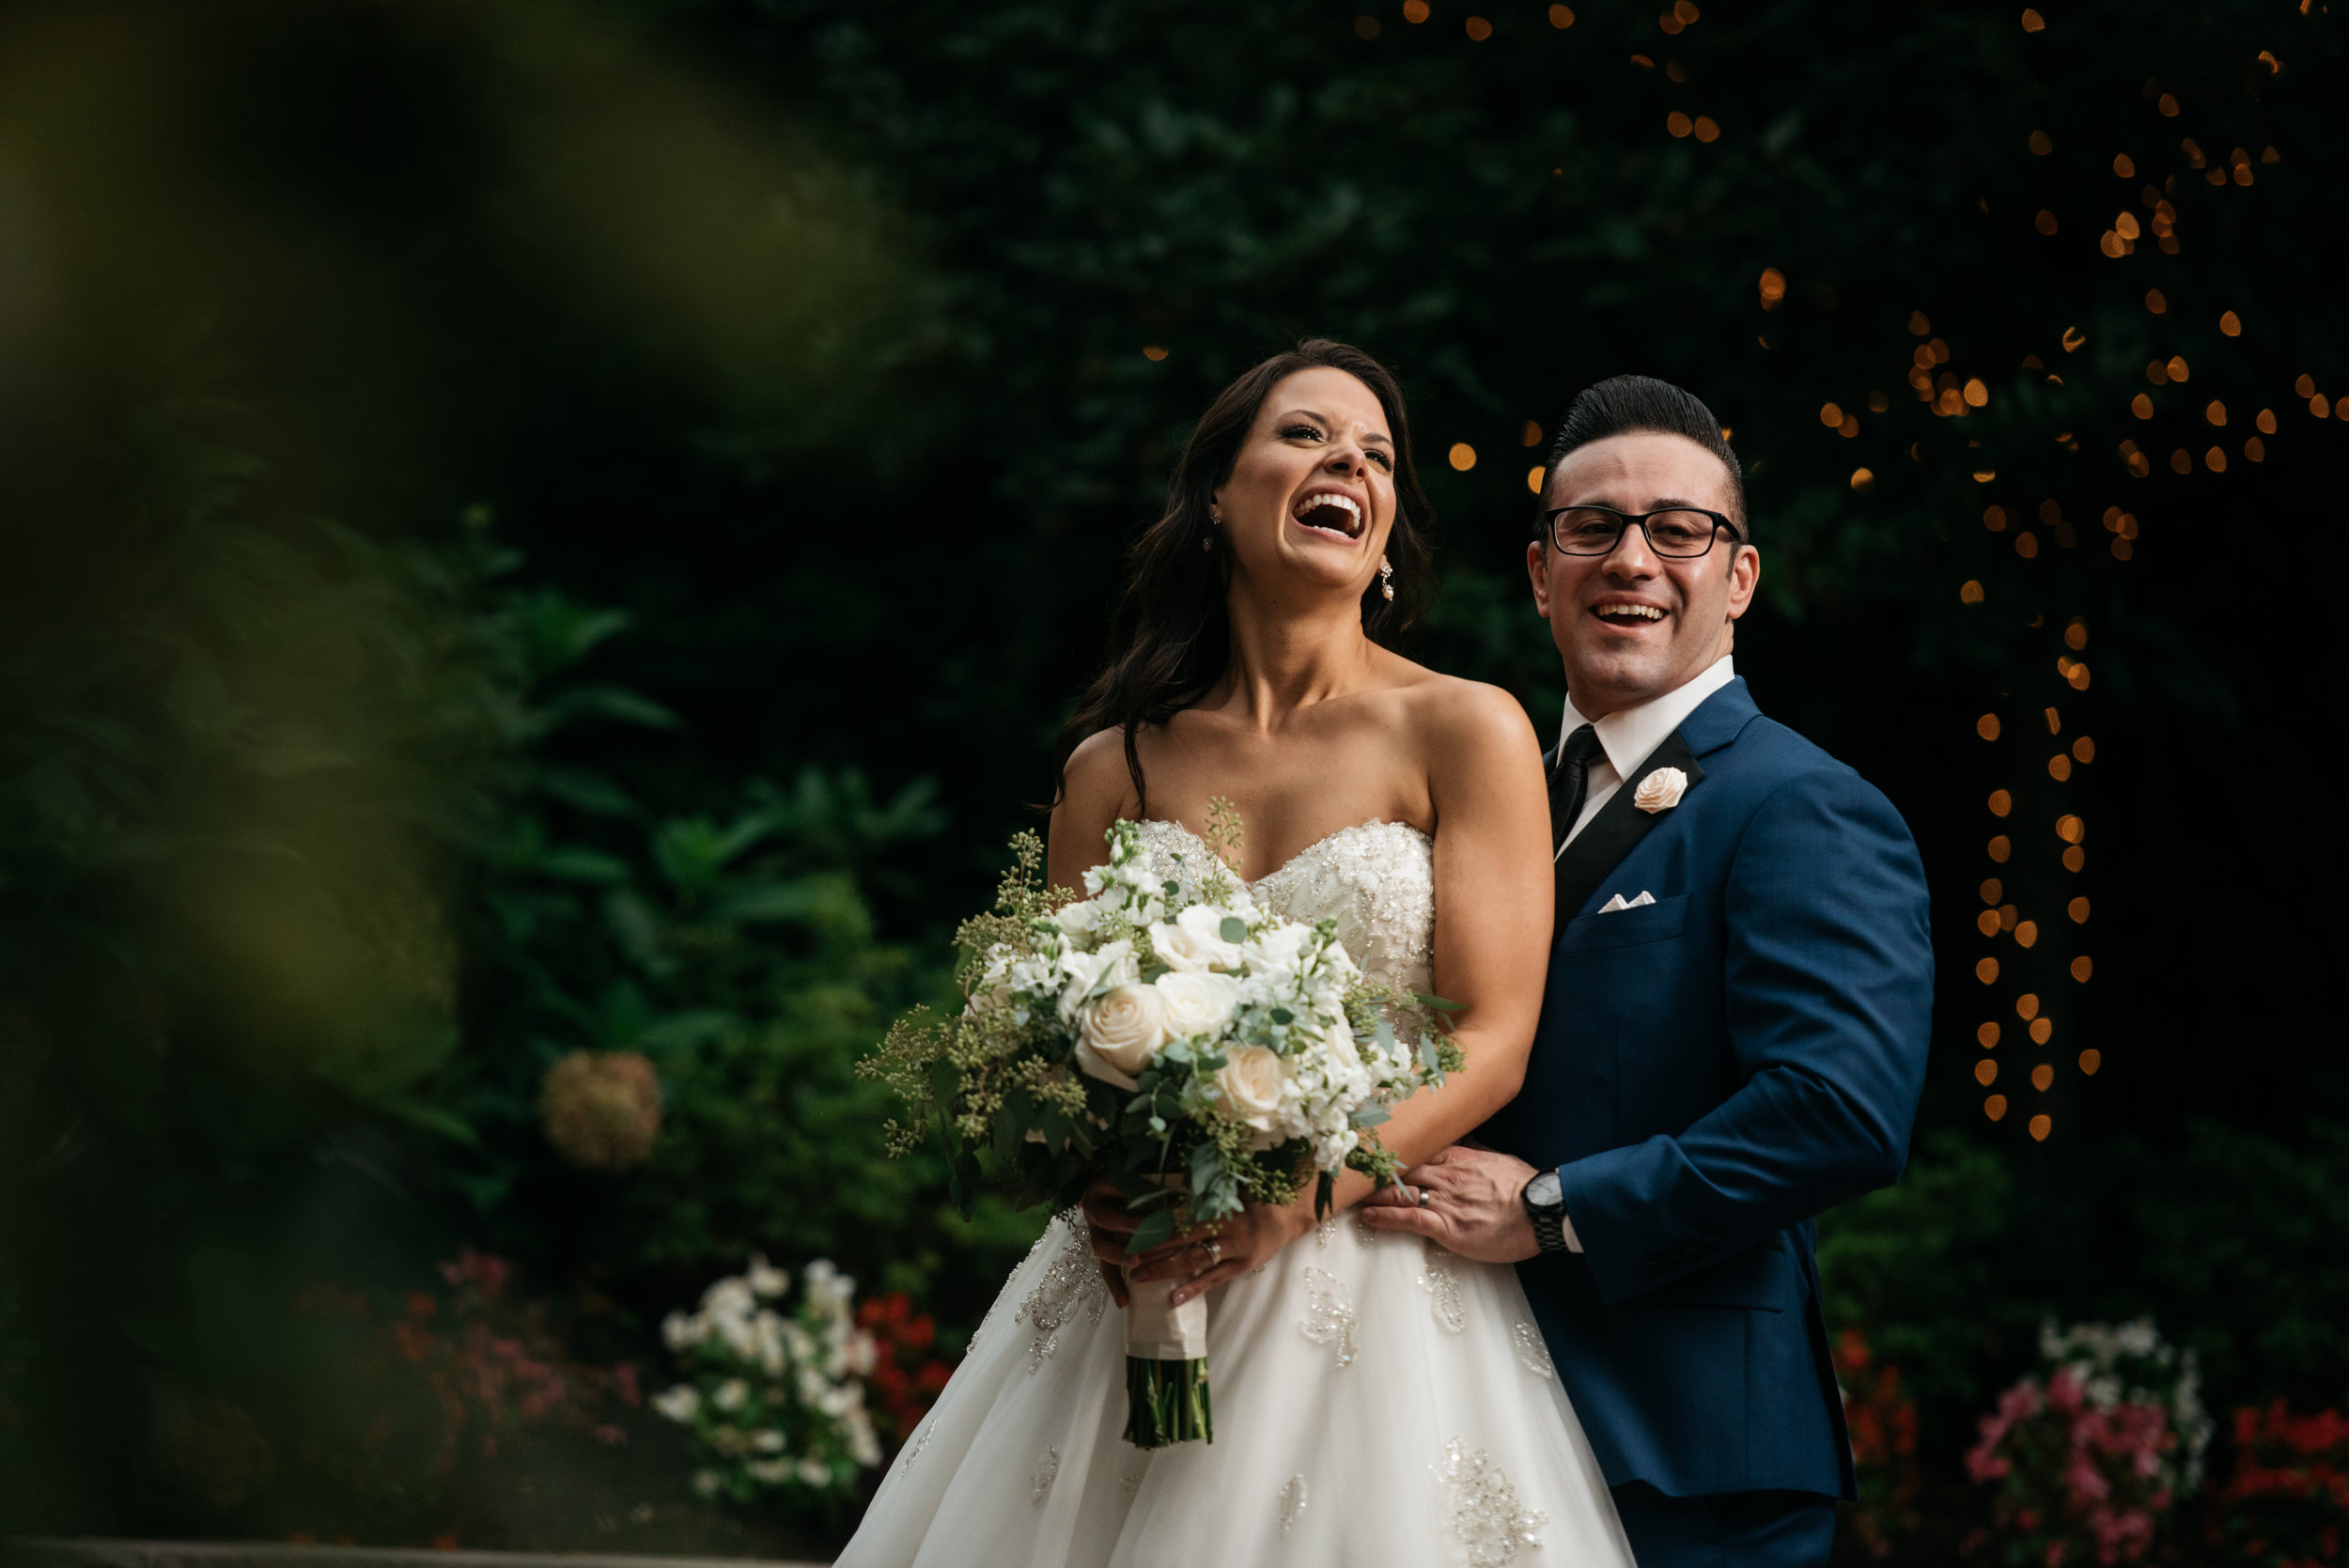 WeddingPhotos | NJPhotographer | Highlights-10-14.jpg